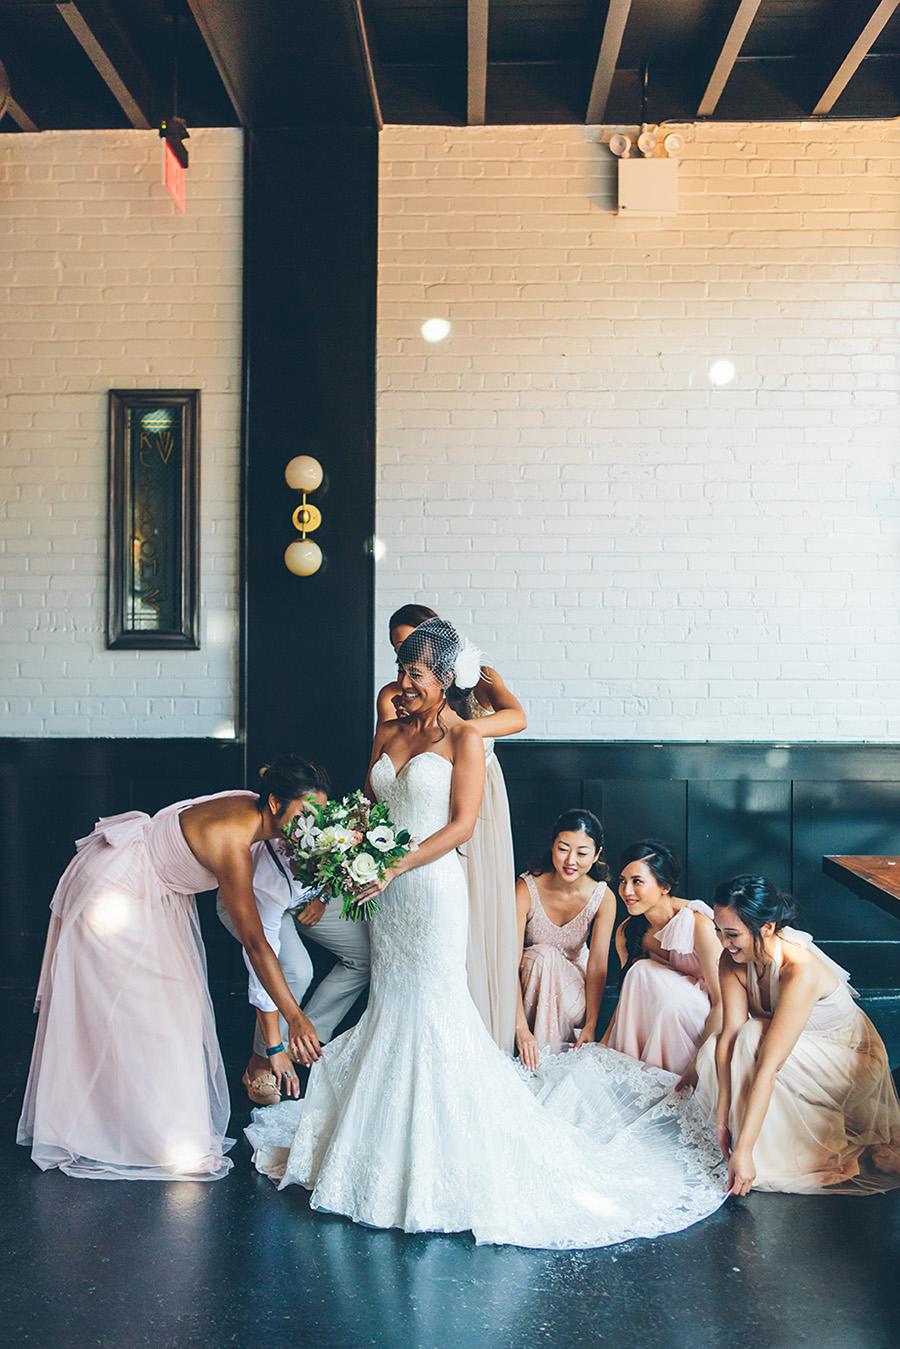 NYC-WEDDING-PHOTOGRAPHER-CITYHALL-ELOPEMENT-501-UNION-BROOKLYN-WEDDING-JILL-JUSTIN0030.jpg